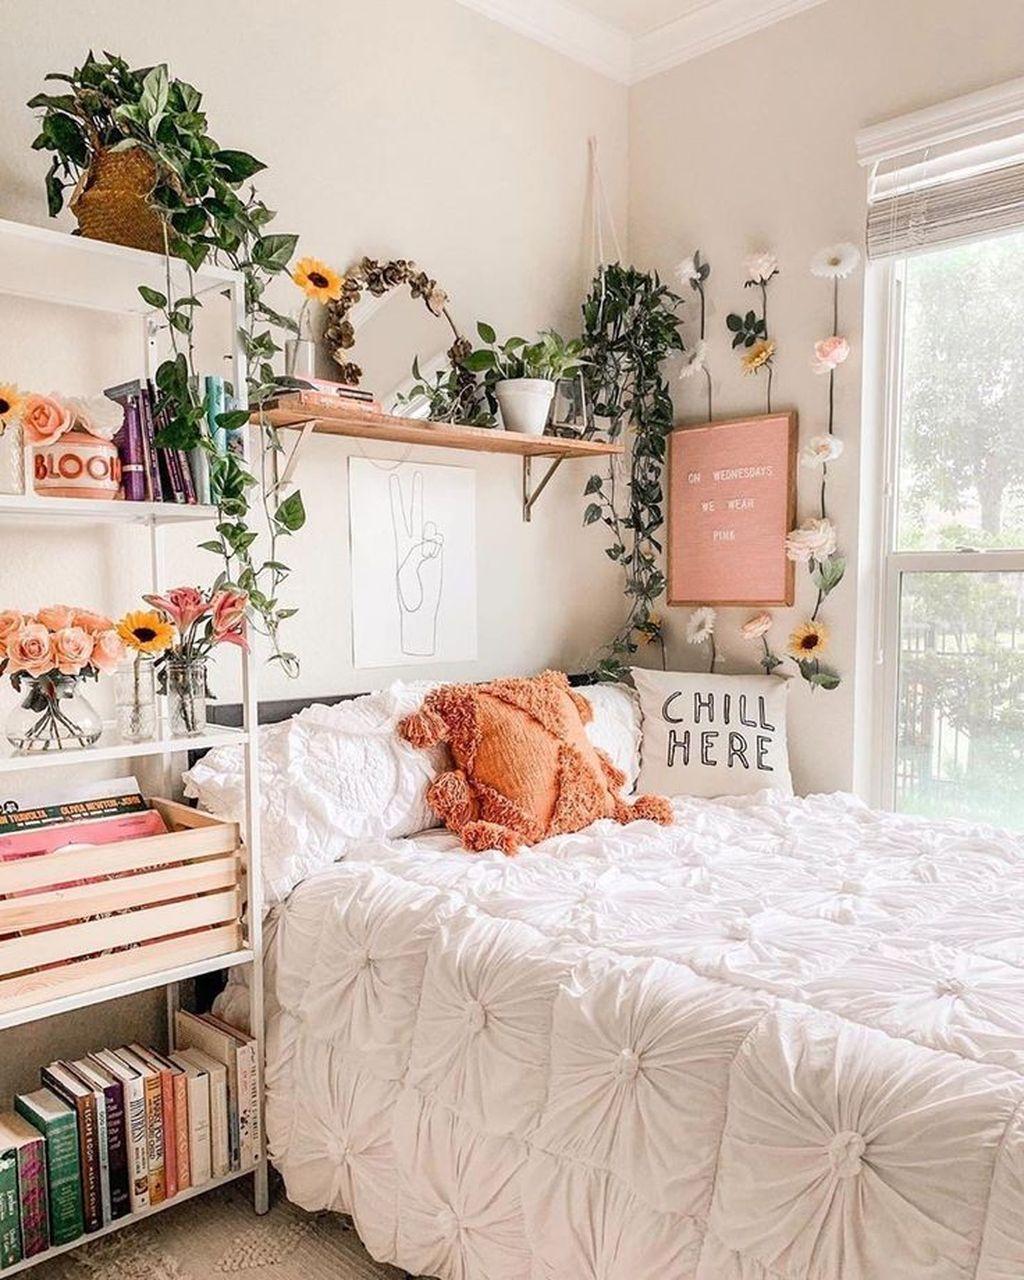 38 Gorgeous Bohemian Bedroom Decor Ideas | Dorm room decor ... on Cheap Bedroom Ideas For Small Rooms  id=91766